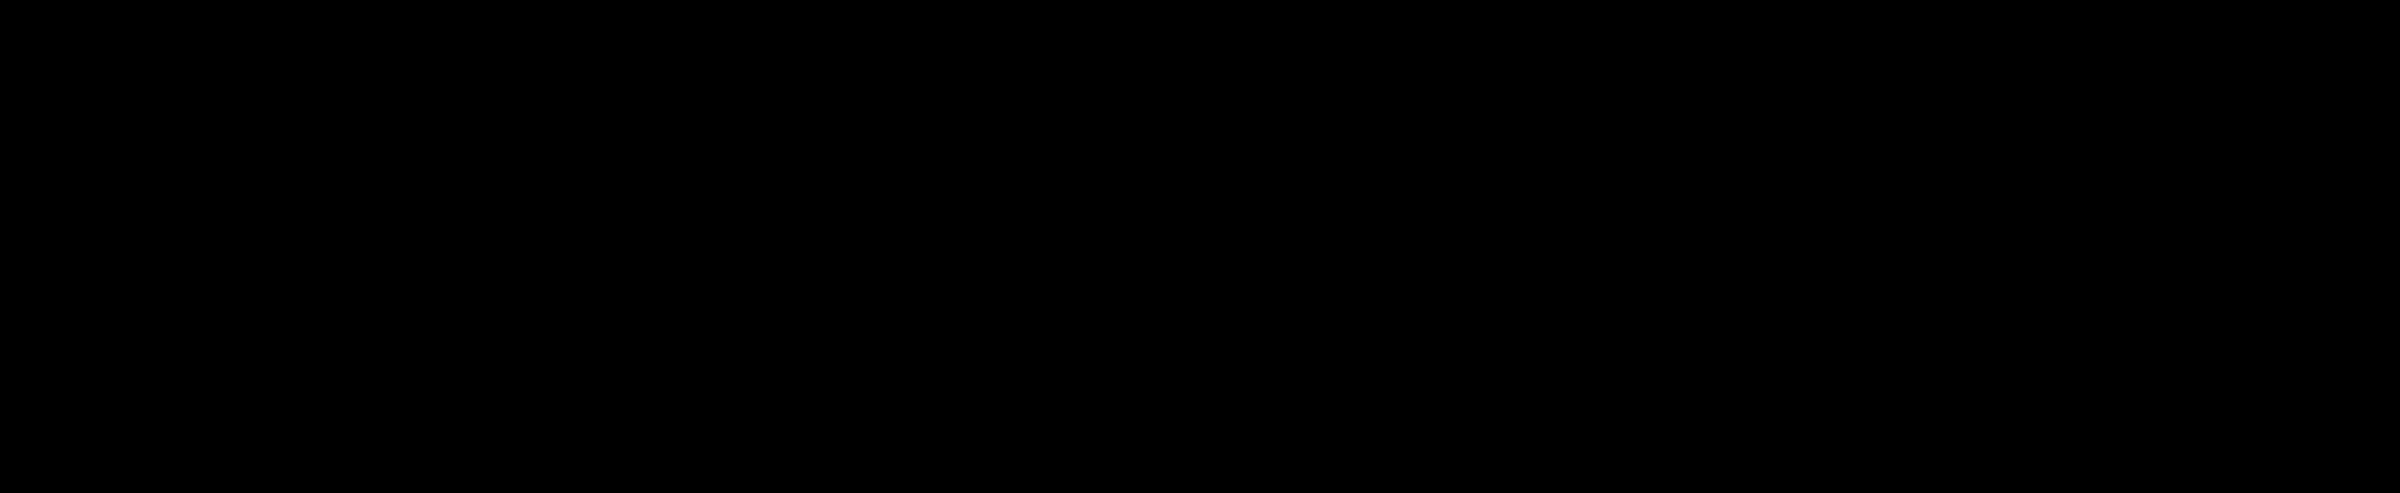 2400x493 Transparent New York Clipart